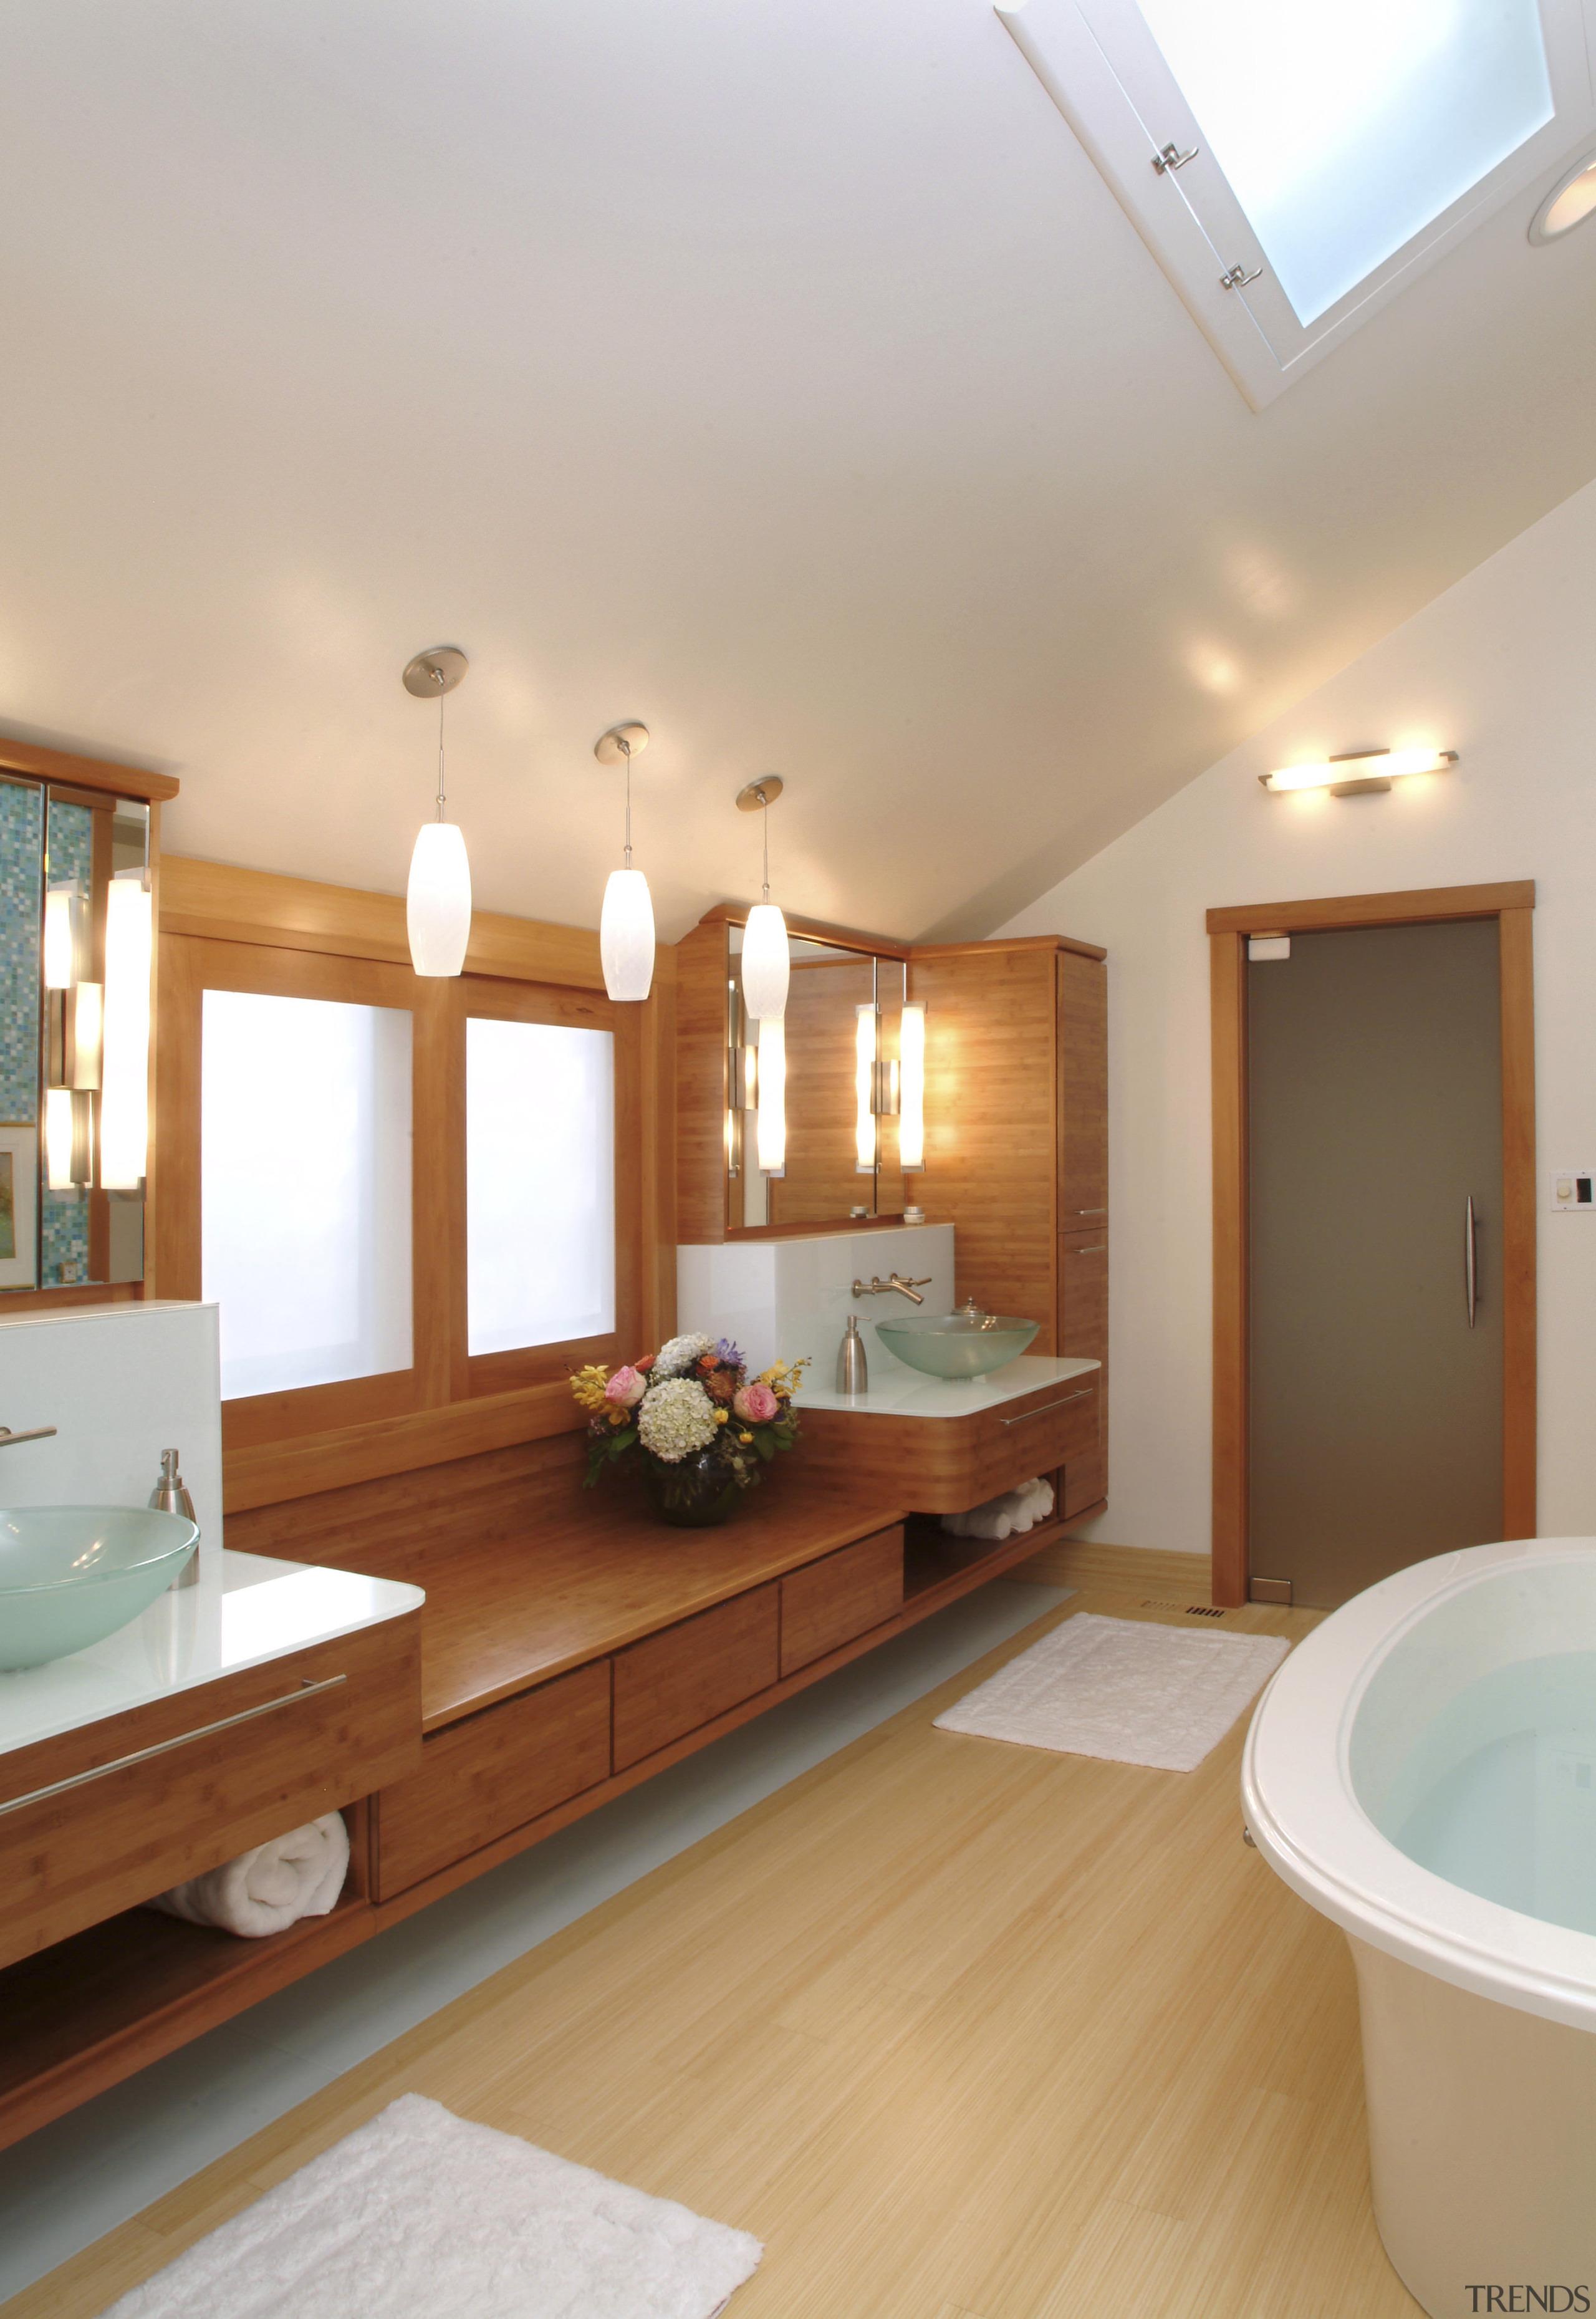 Image of a bathroom designed by an NKBA bathroom, ceiling, floor, flooring, hardwood, home, interior design, real estate, room, sink, wood flooring, gray, orange